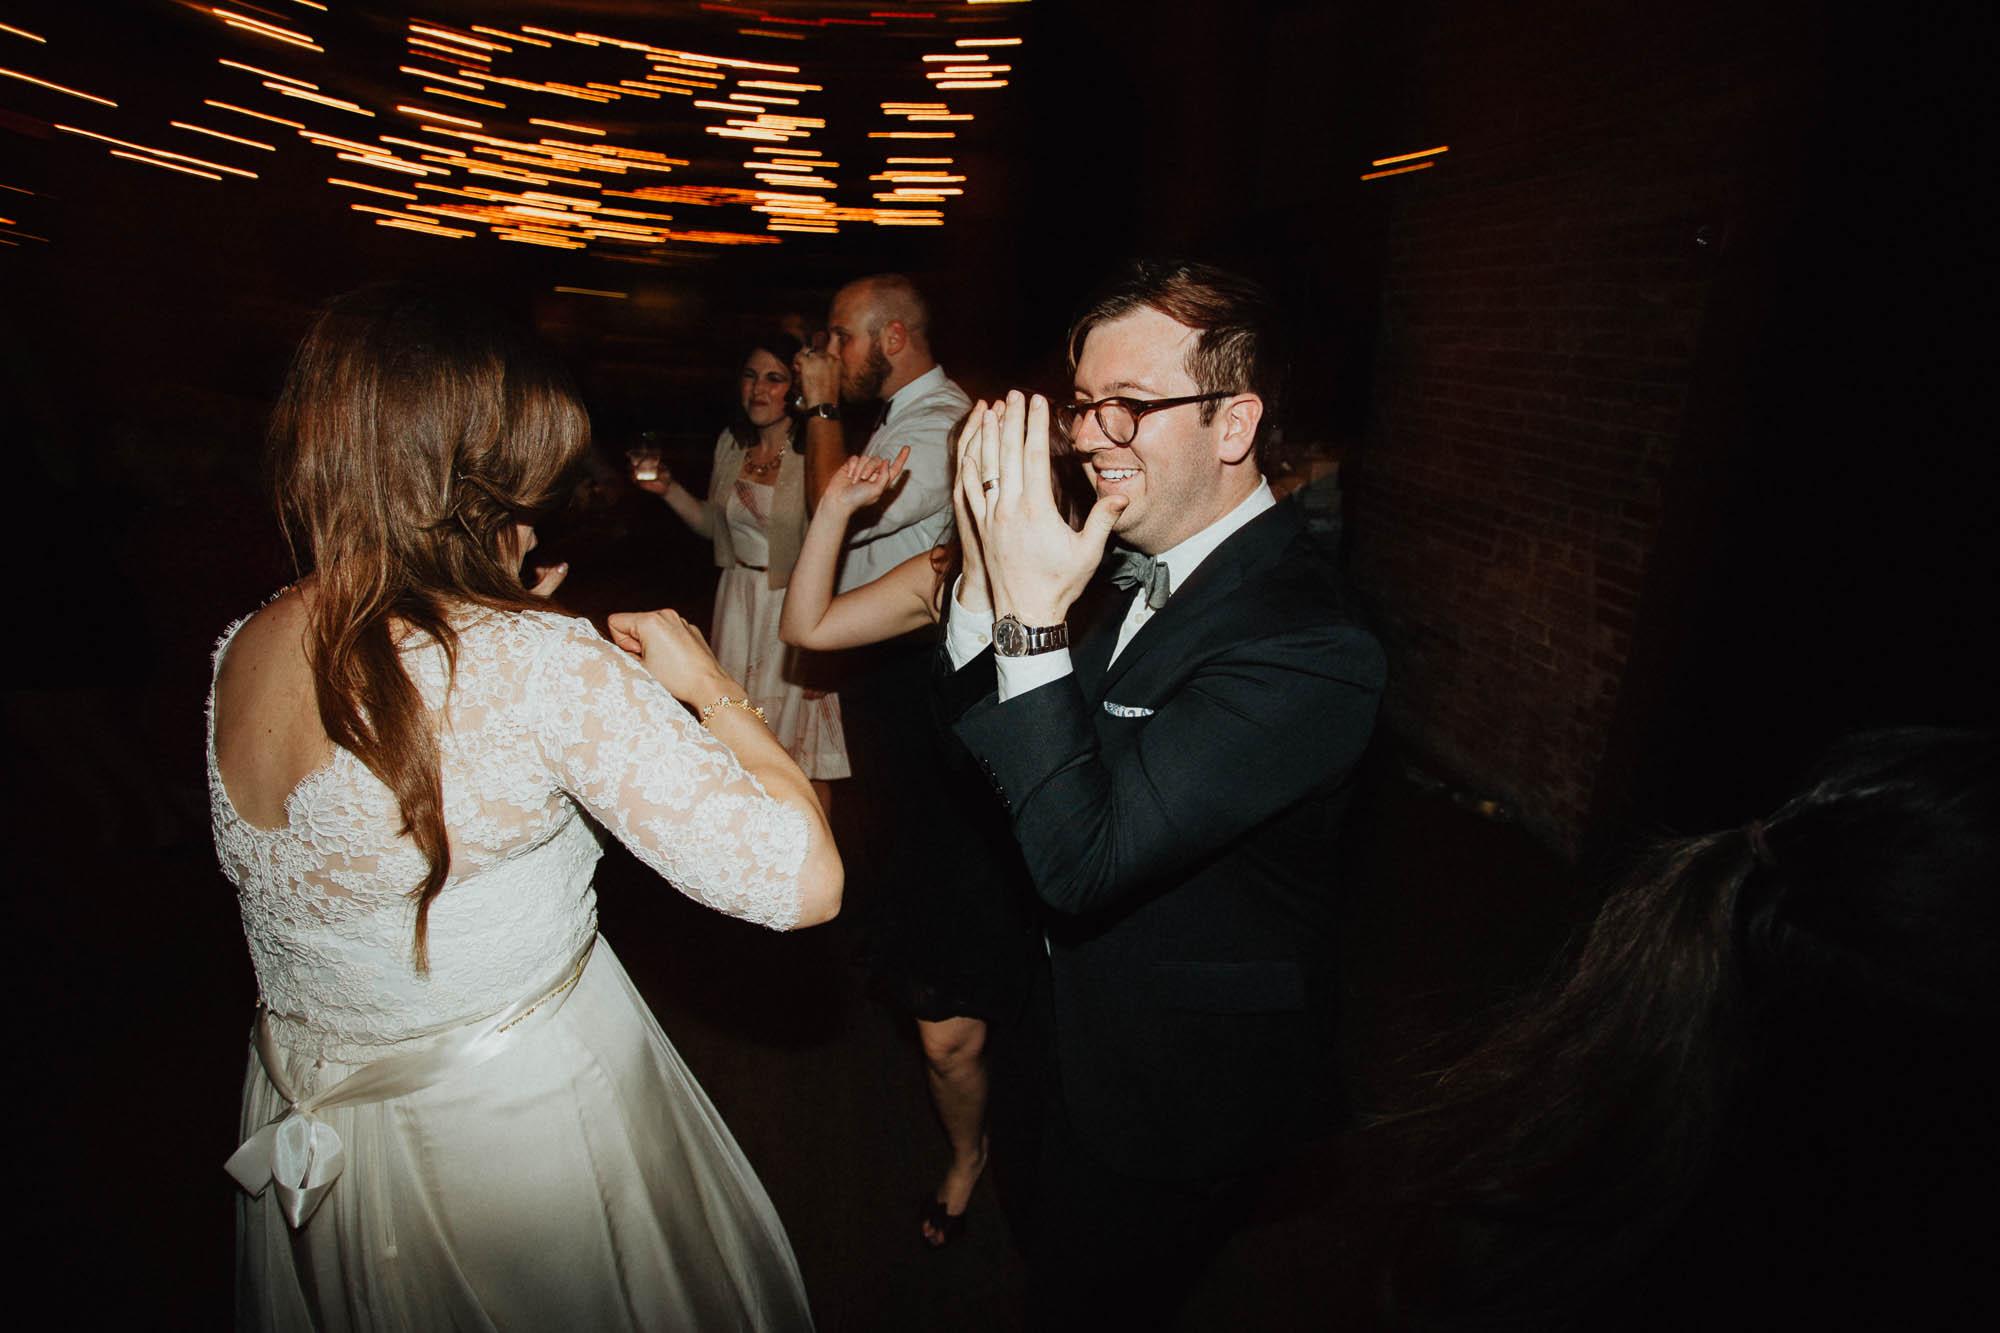 Highline-Car-House-Wedding-Columbus-Kristin-Aaron-123.jpg